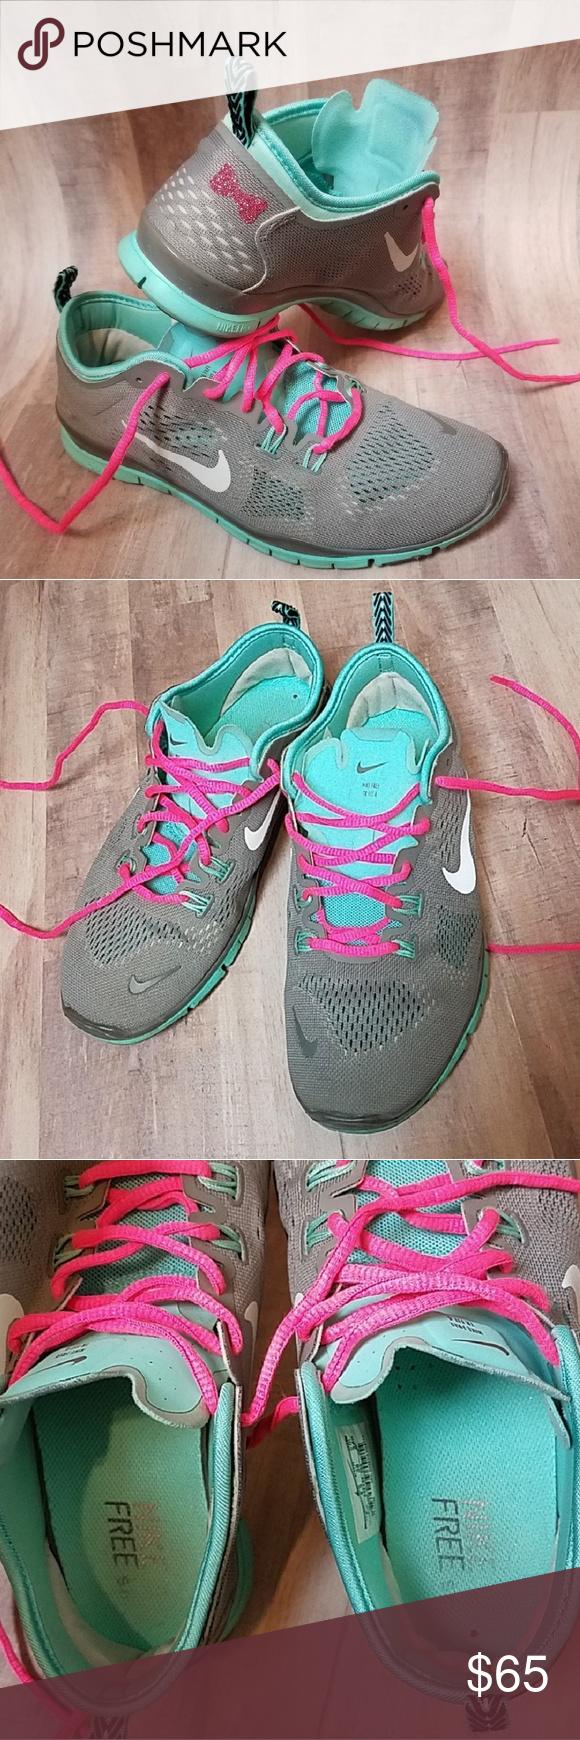 newest 0519d c70a7 Custom Bow Nike Free TR FIT 4 pink teak gray Nike Free TR Fit 4